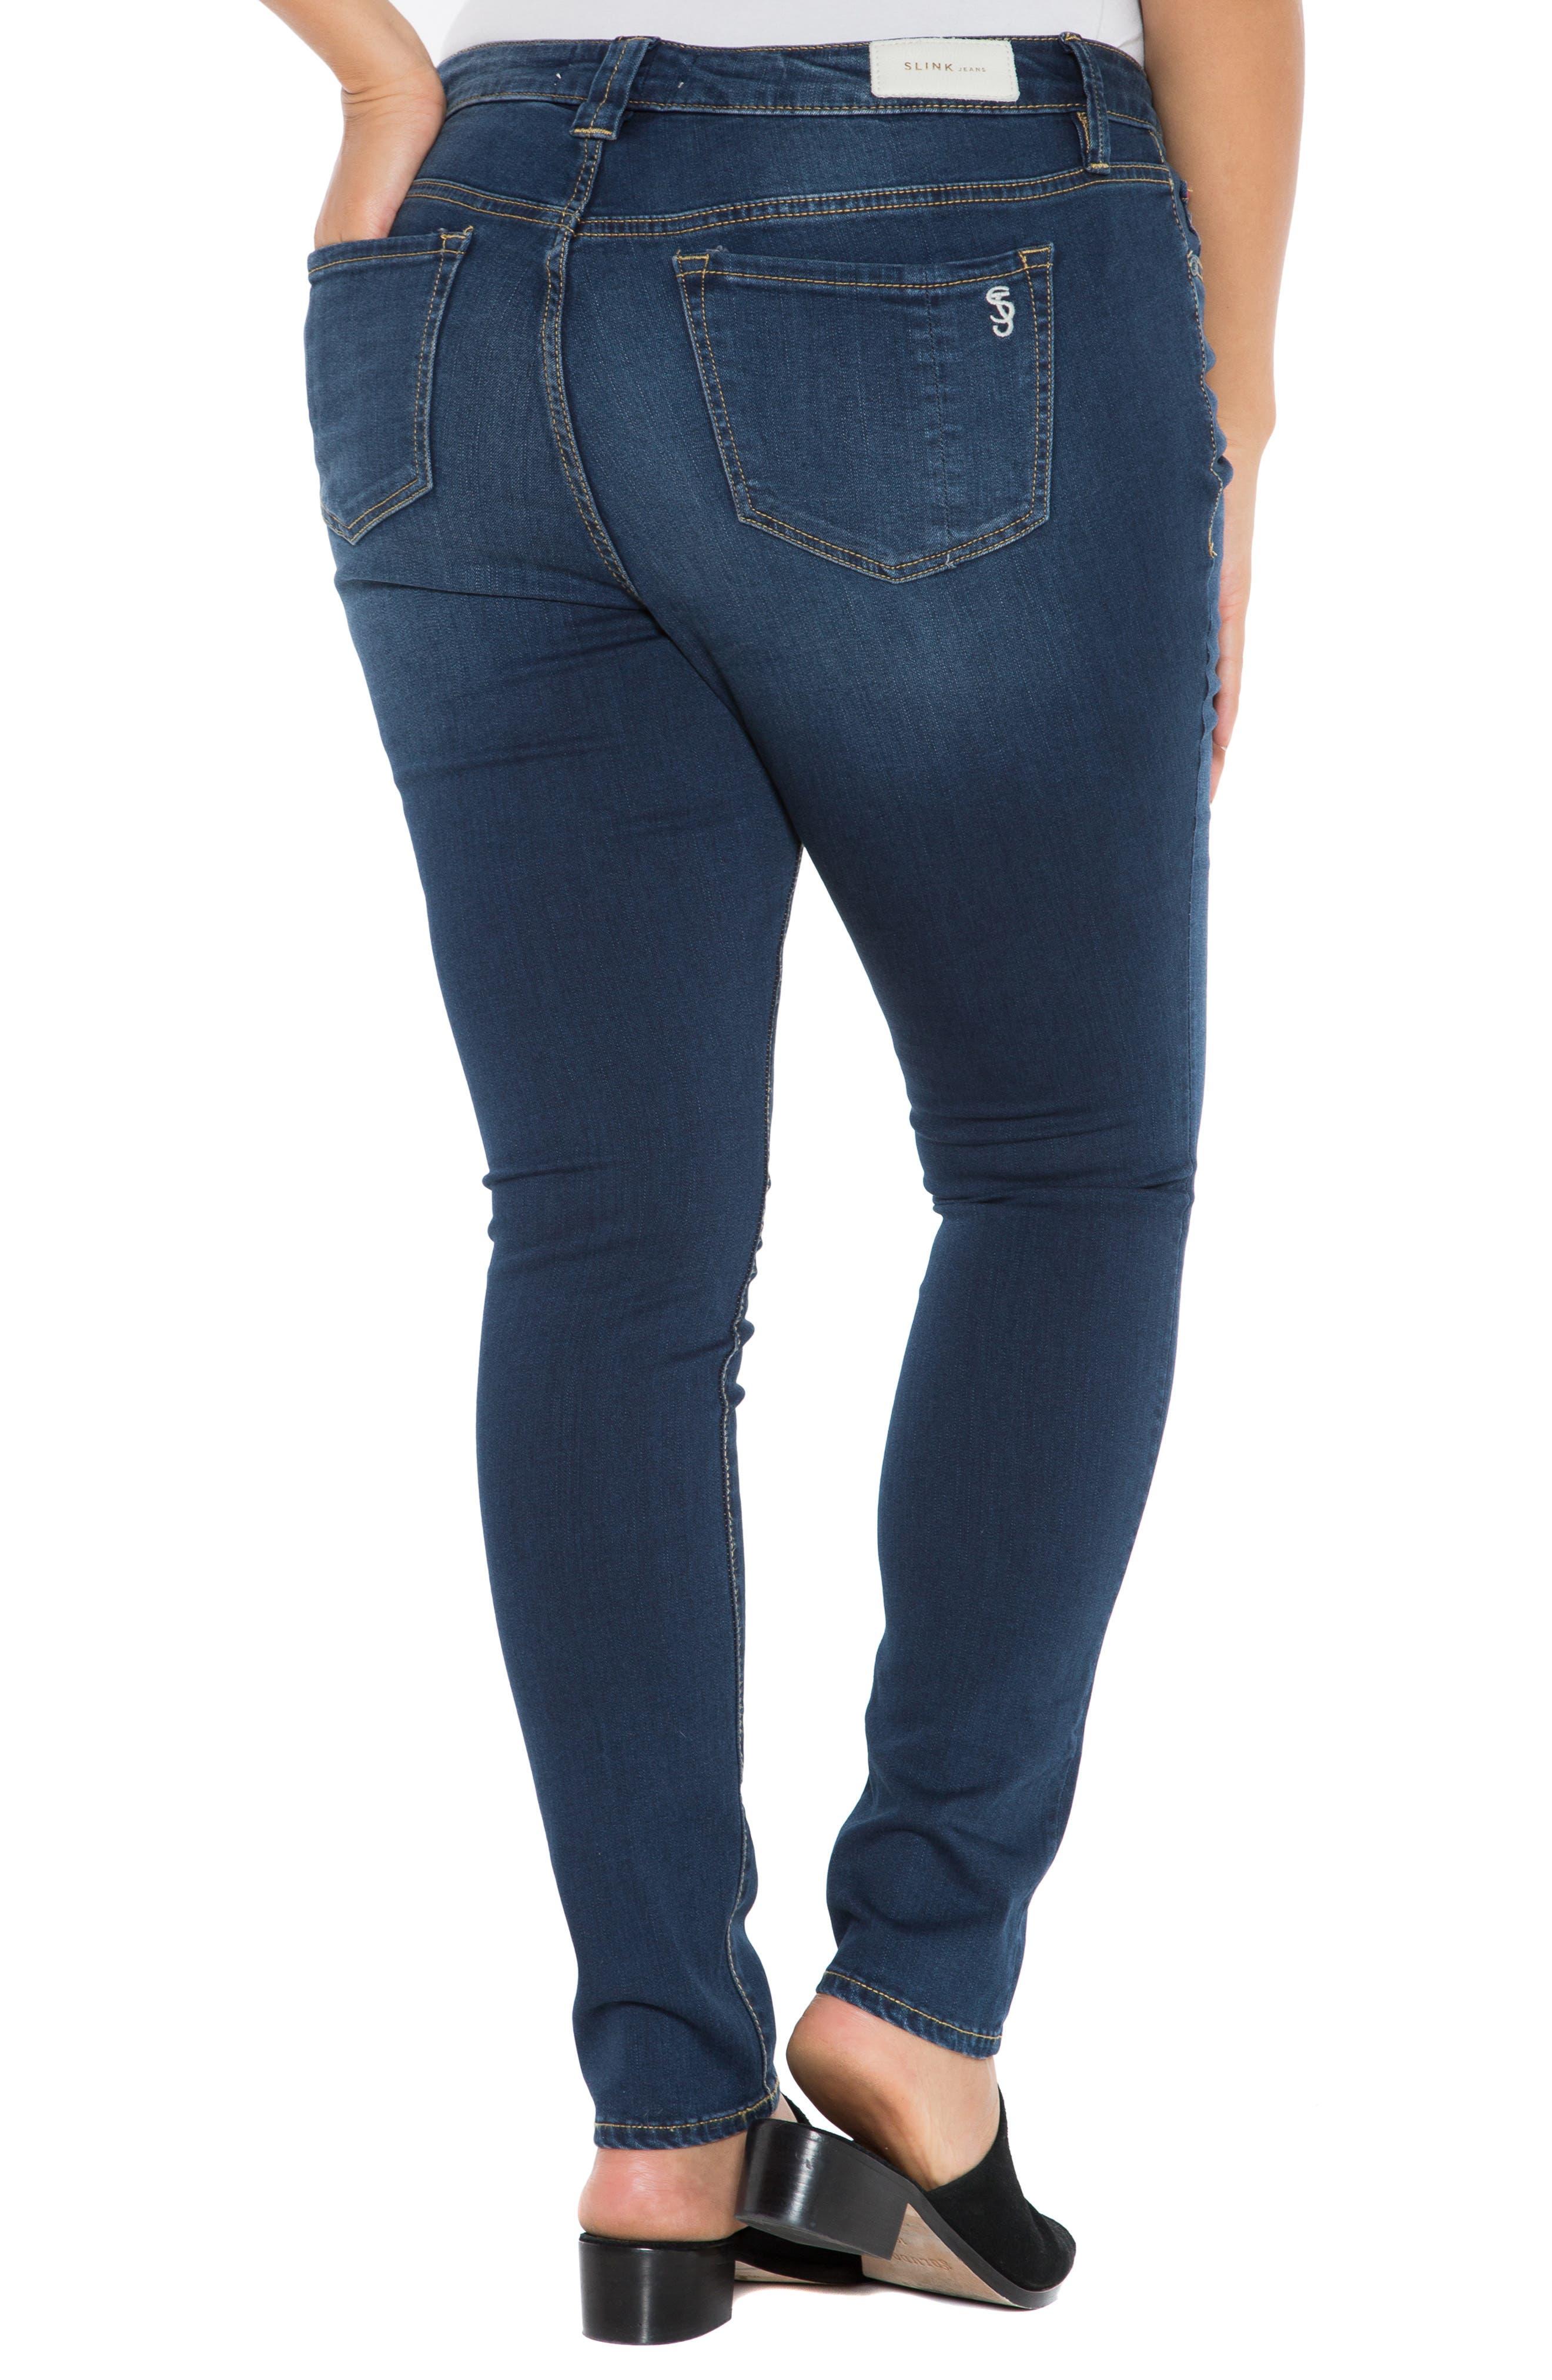 SLINK JEANS, 'The Skinny' Stretch Denim Jeans, Alternate thumbnail 2, color, AMBER